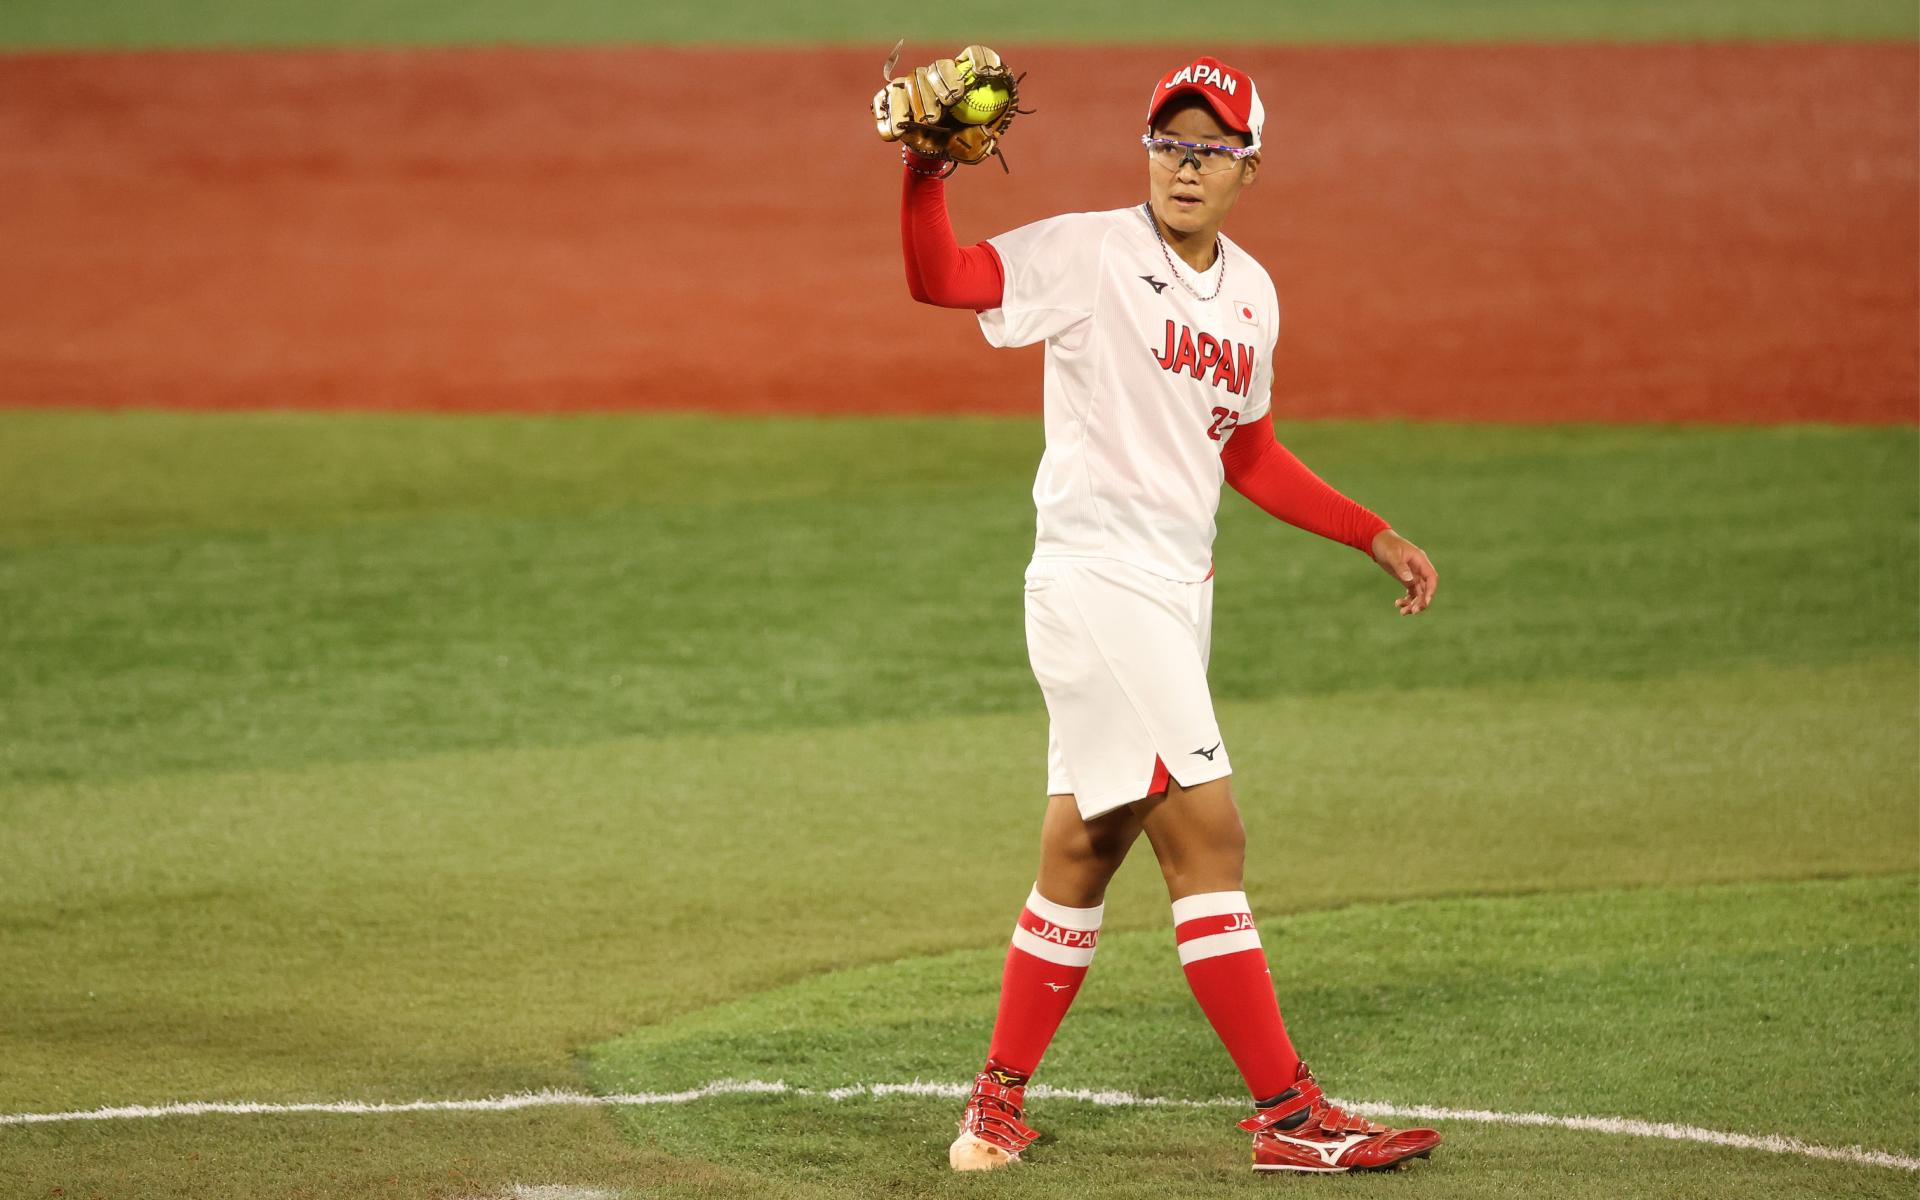 Фото: Yuichi Masuda/Getty Images